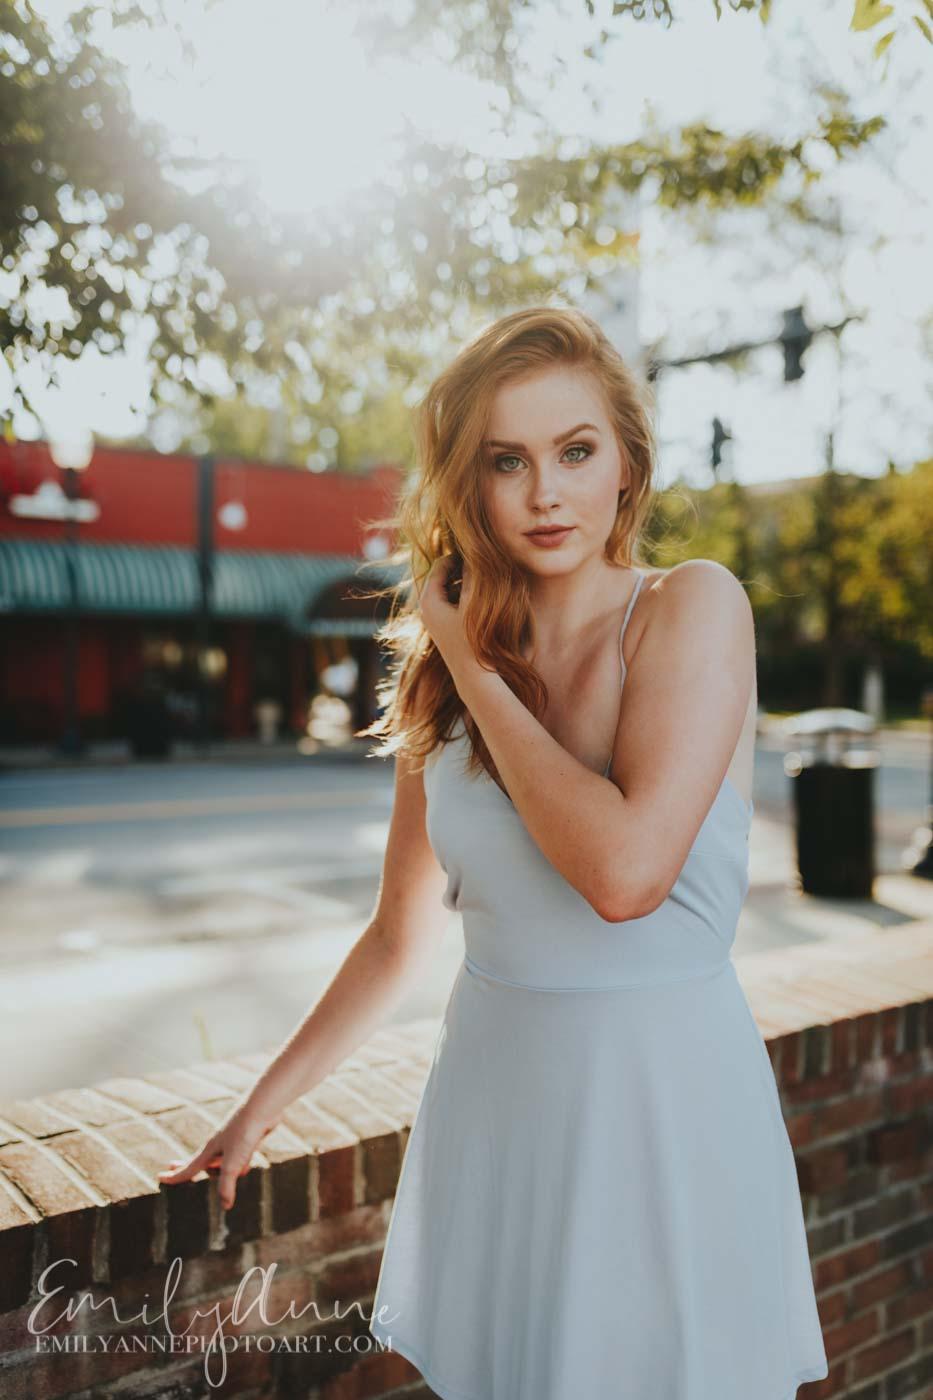 top model/celebrity photographer Nashville TN Emily Anne Photo Art